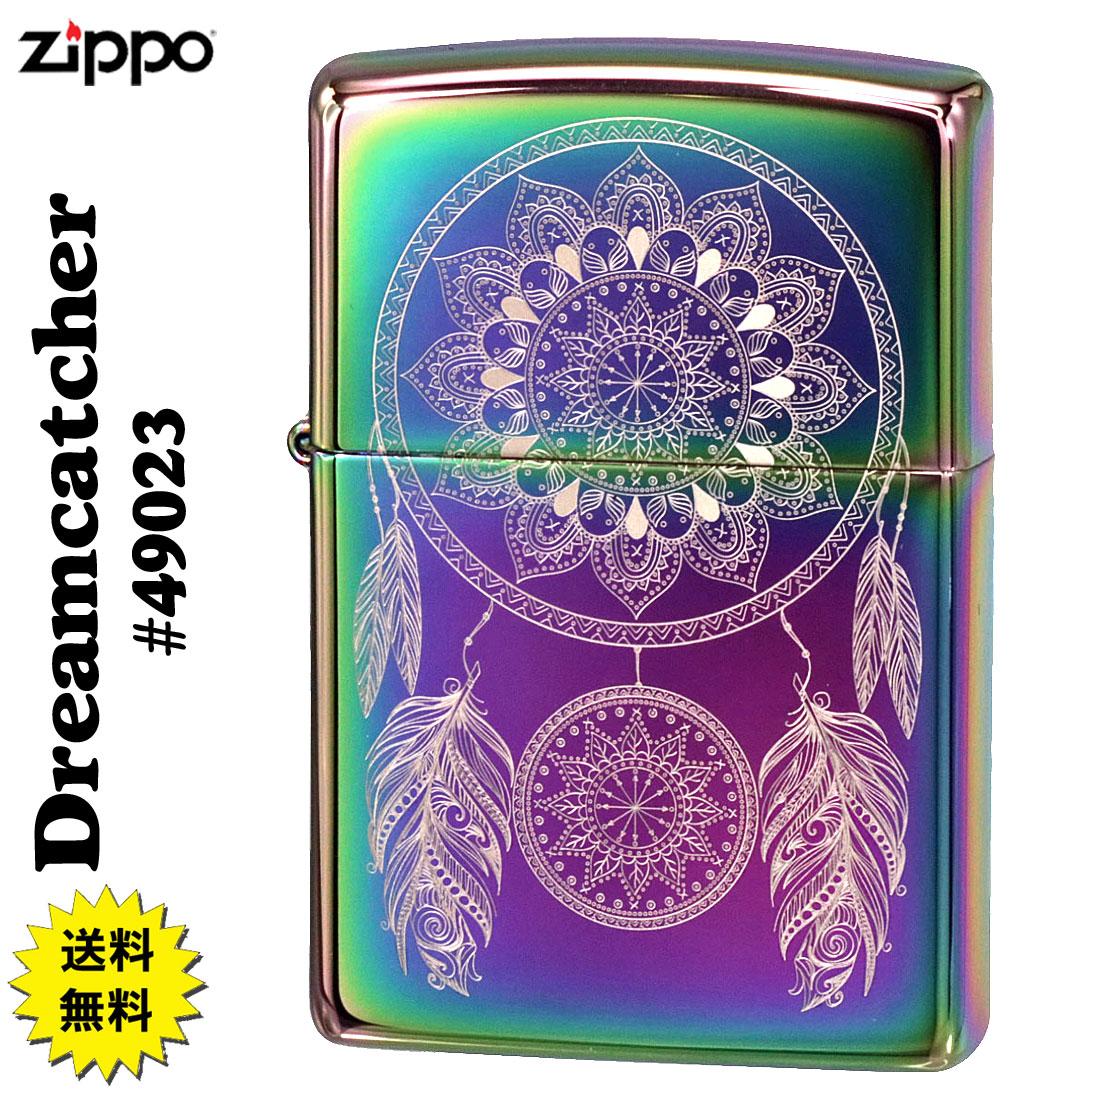 ZIPPO(ジッポーライター) Dreamcatcher ドリームキャッチャー マルチカラー#49023画像